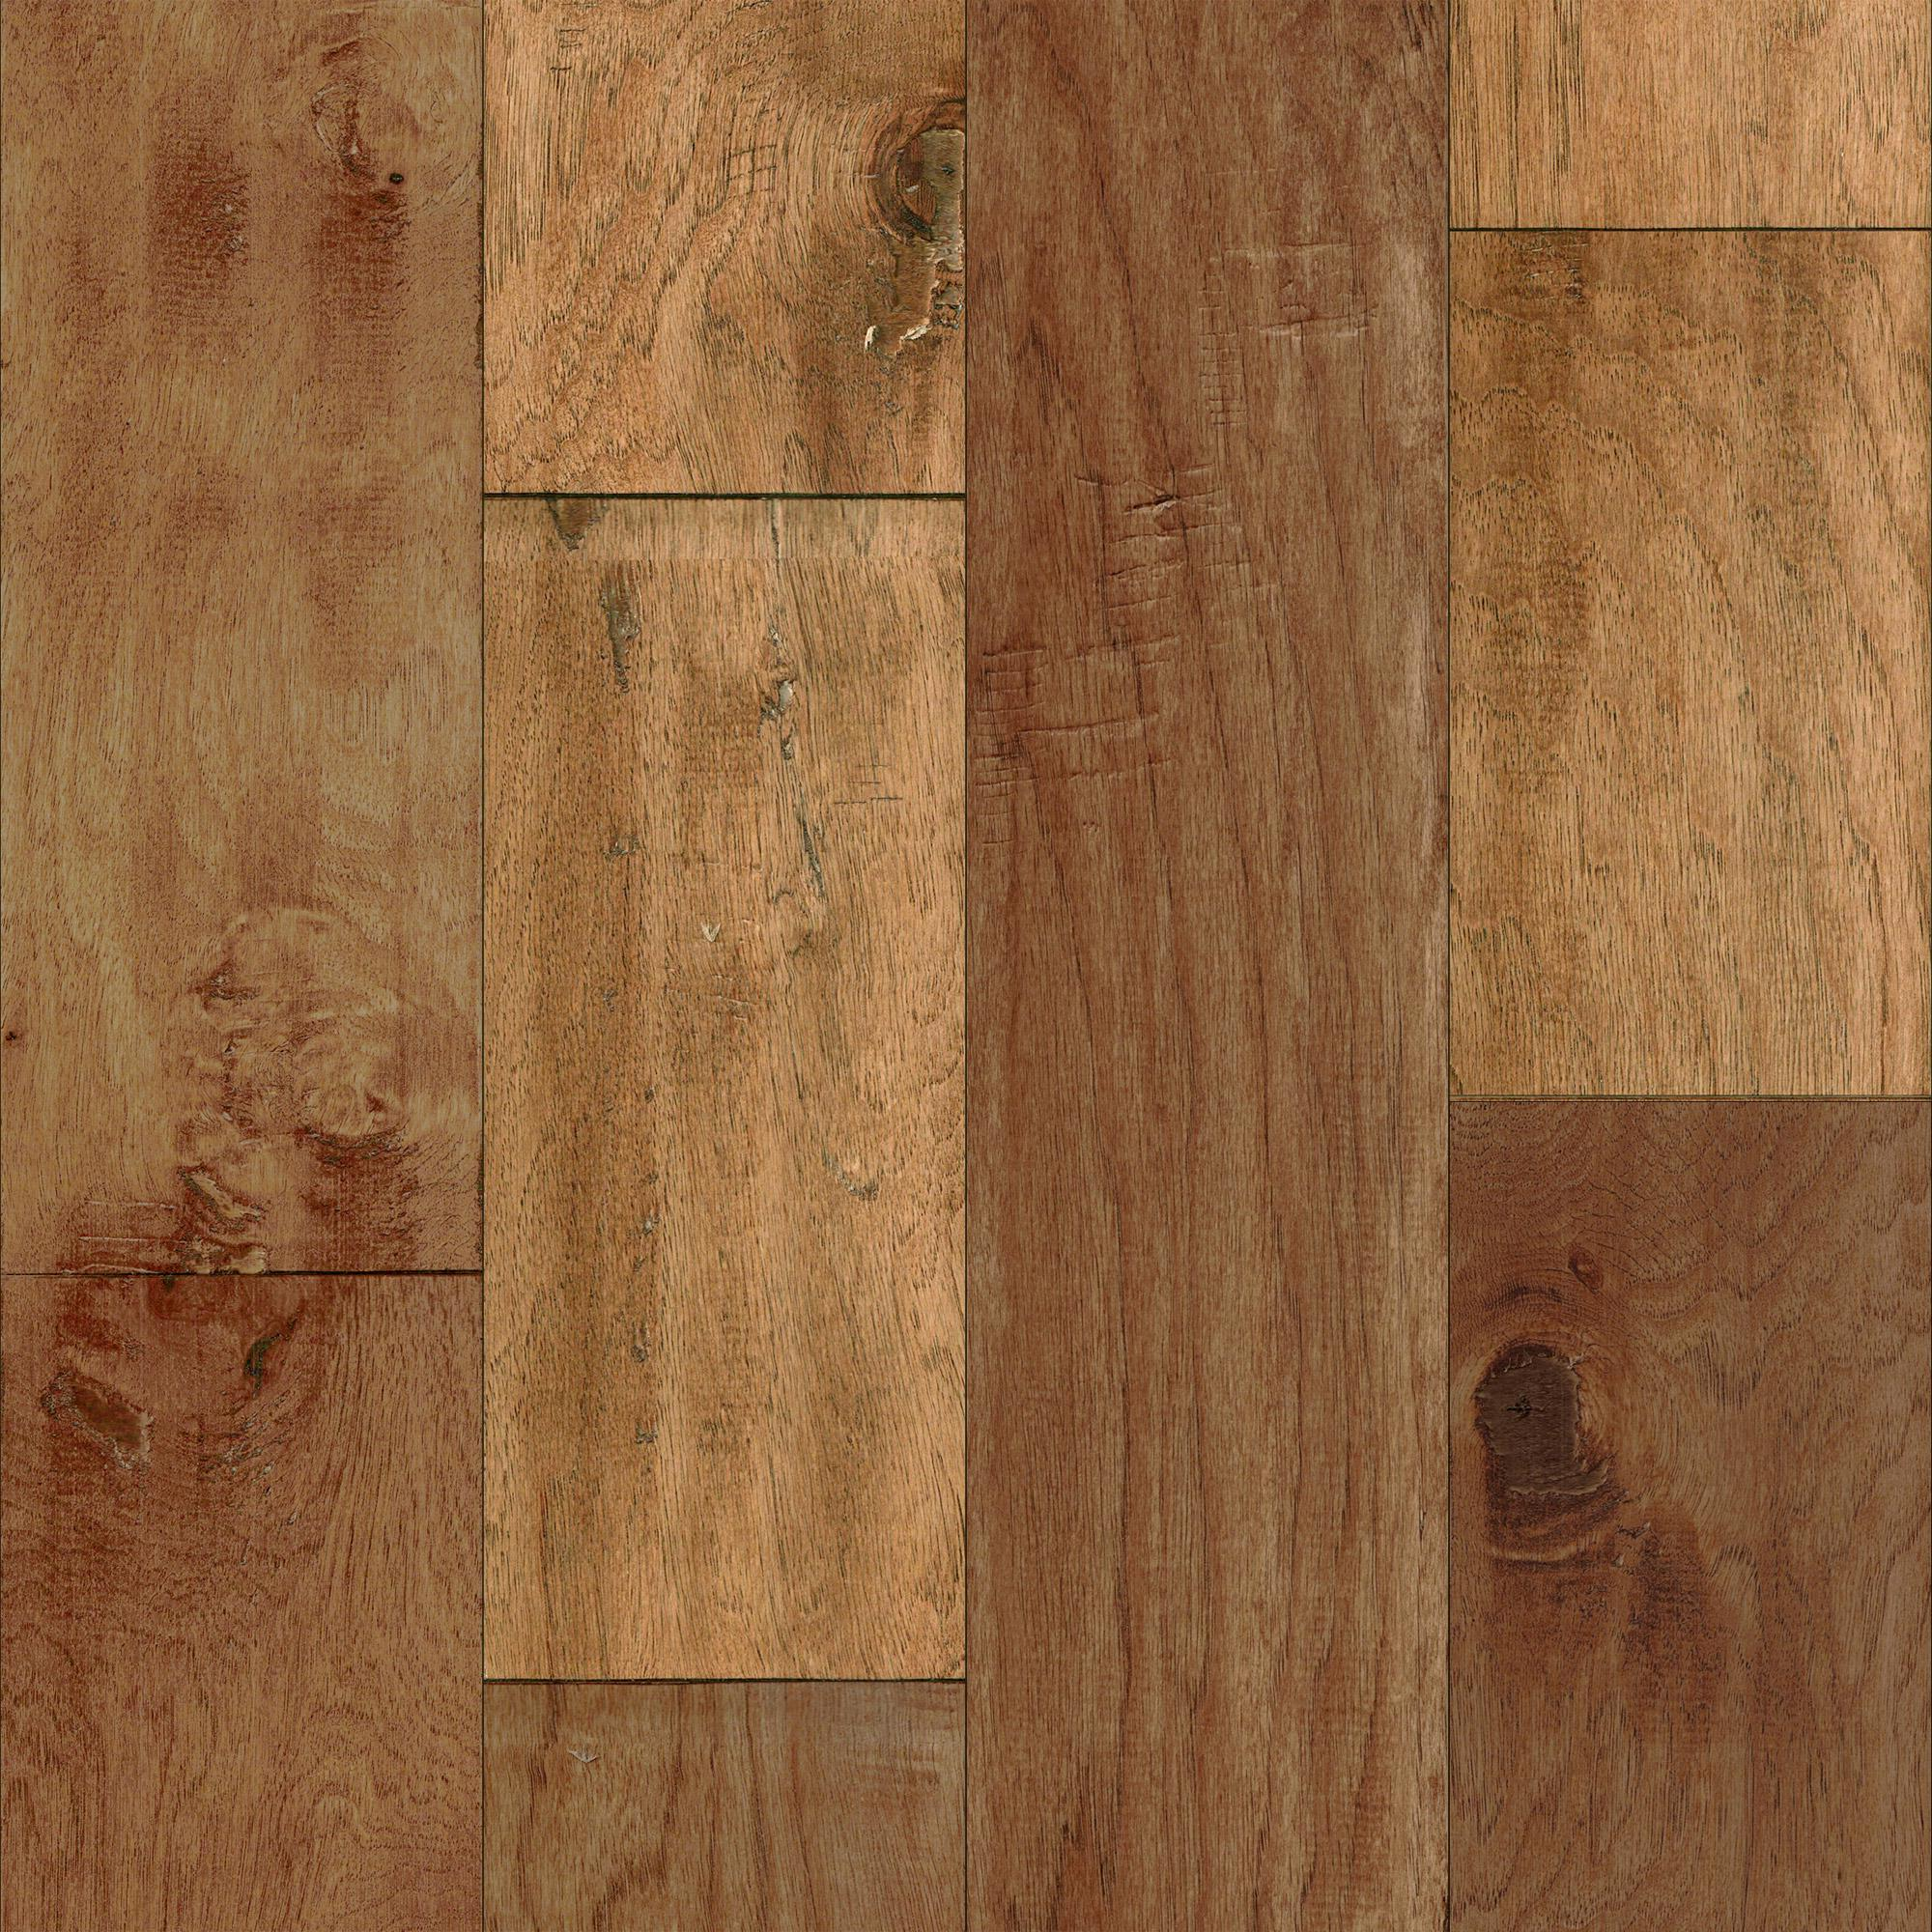 Mohawk Engineered Wood Flooring Reviews Adhesive